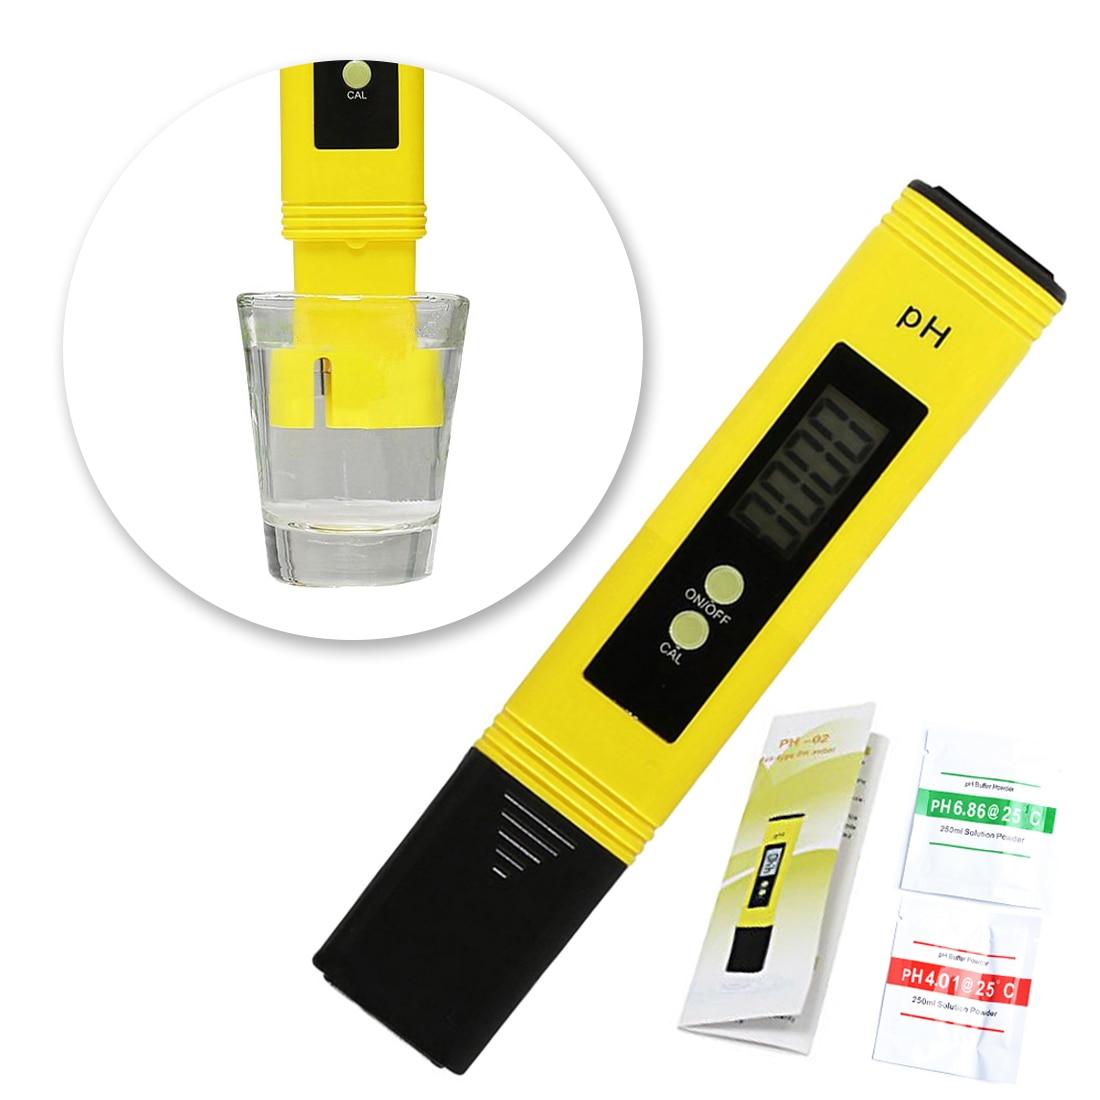 LCD Digital PH Meter Pen of Tester Accuracy 0.1 Aquarium Pool Water Wine Urine Automatic Calibration New Protable